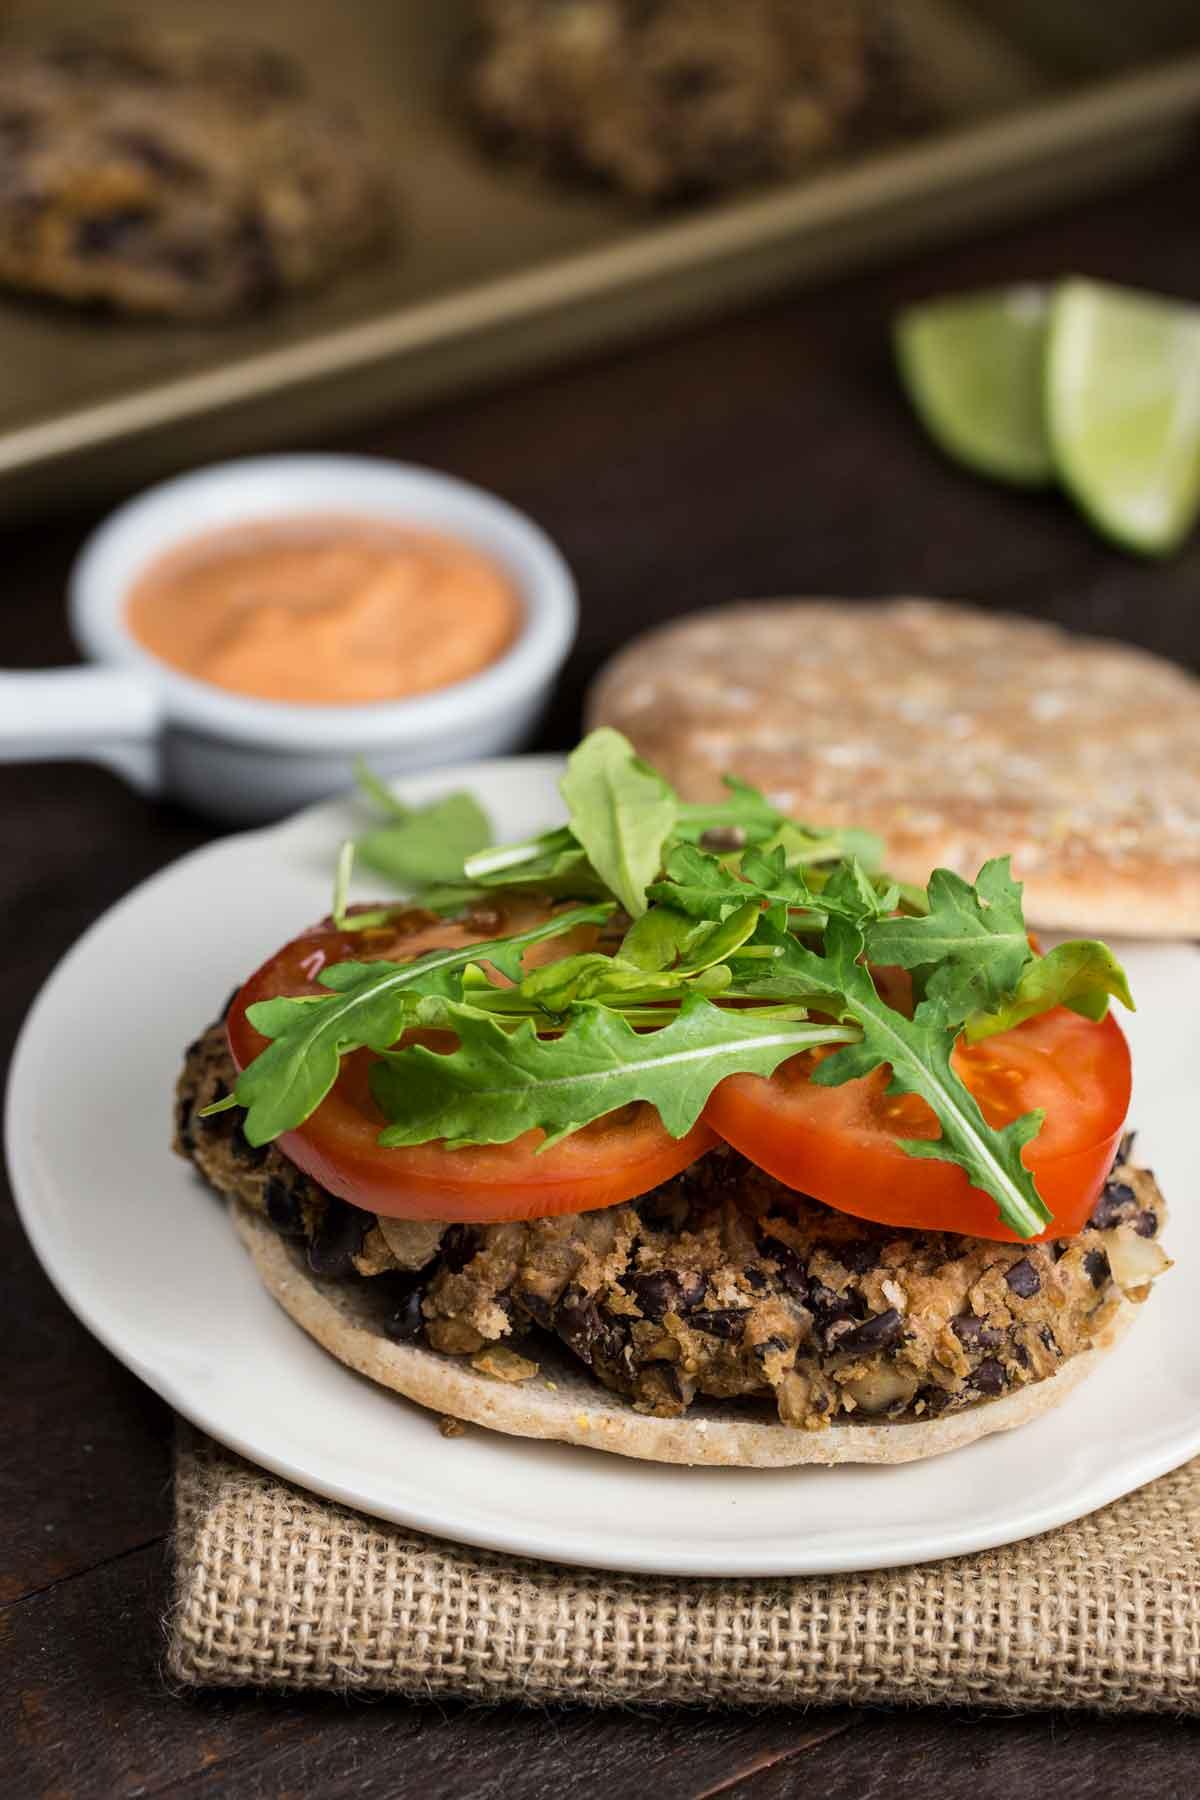 Skinny Shiitake Black Bean Burgers with Spicy Aioli Sauce | via veggiechick.com #vegan